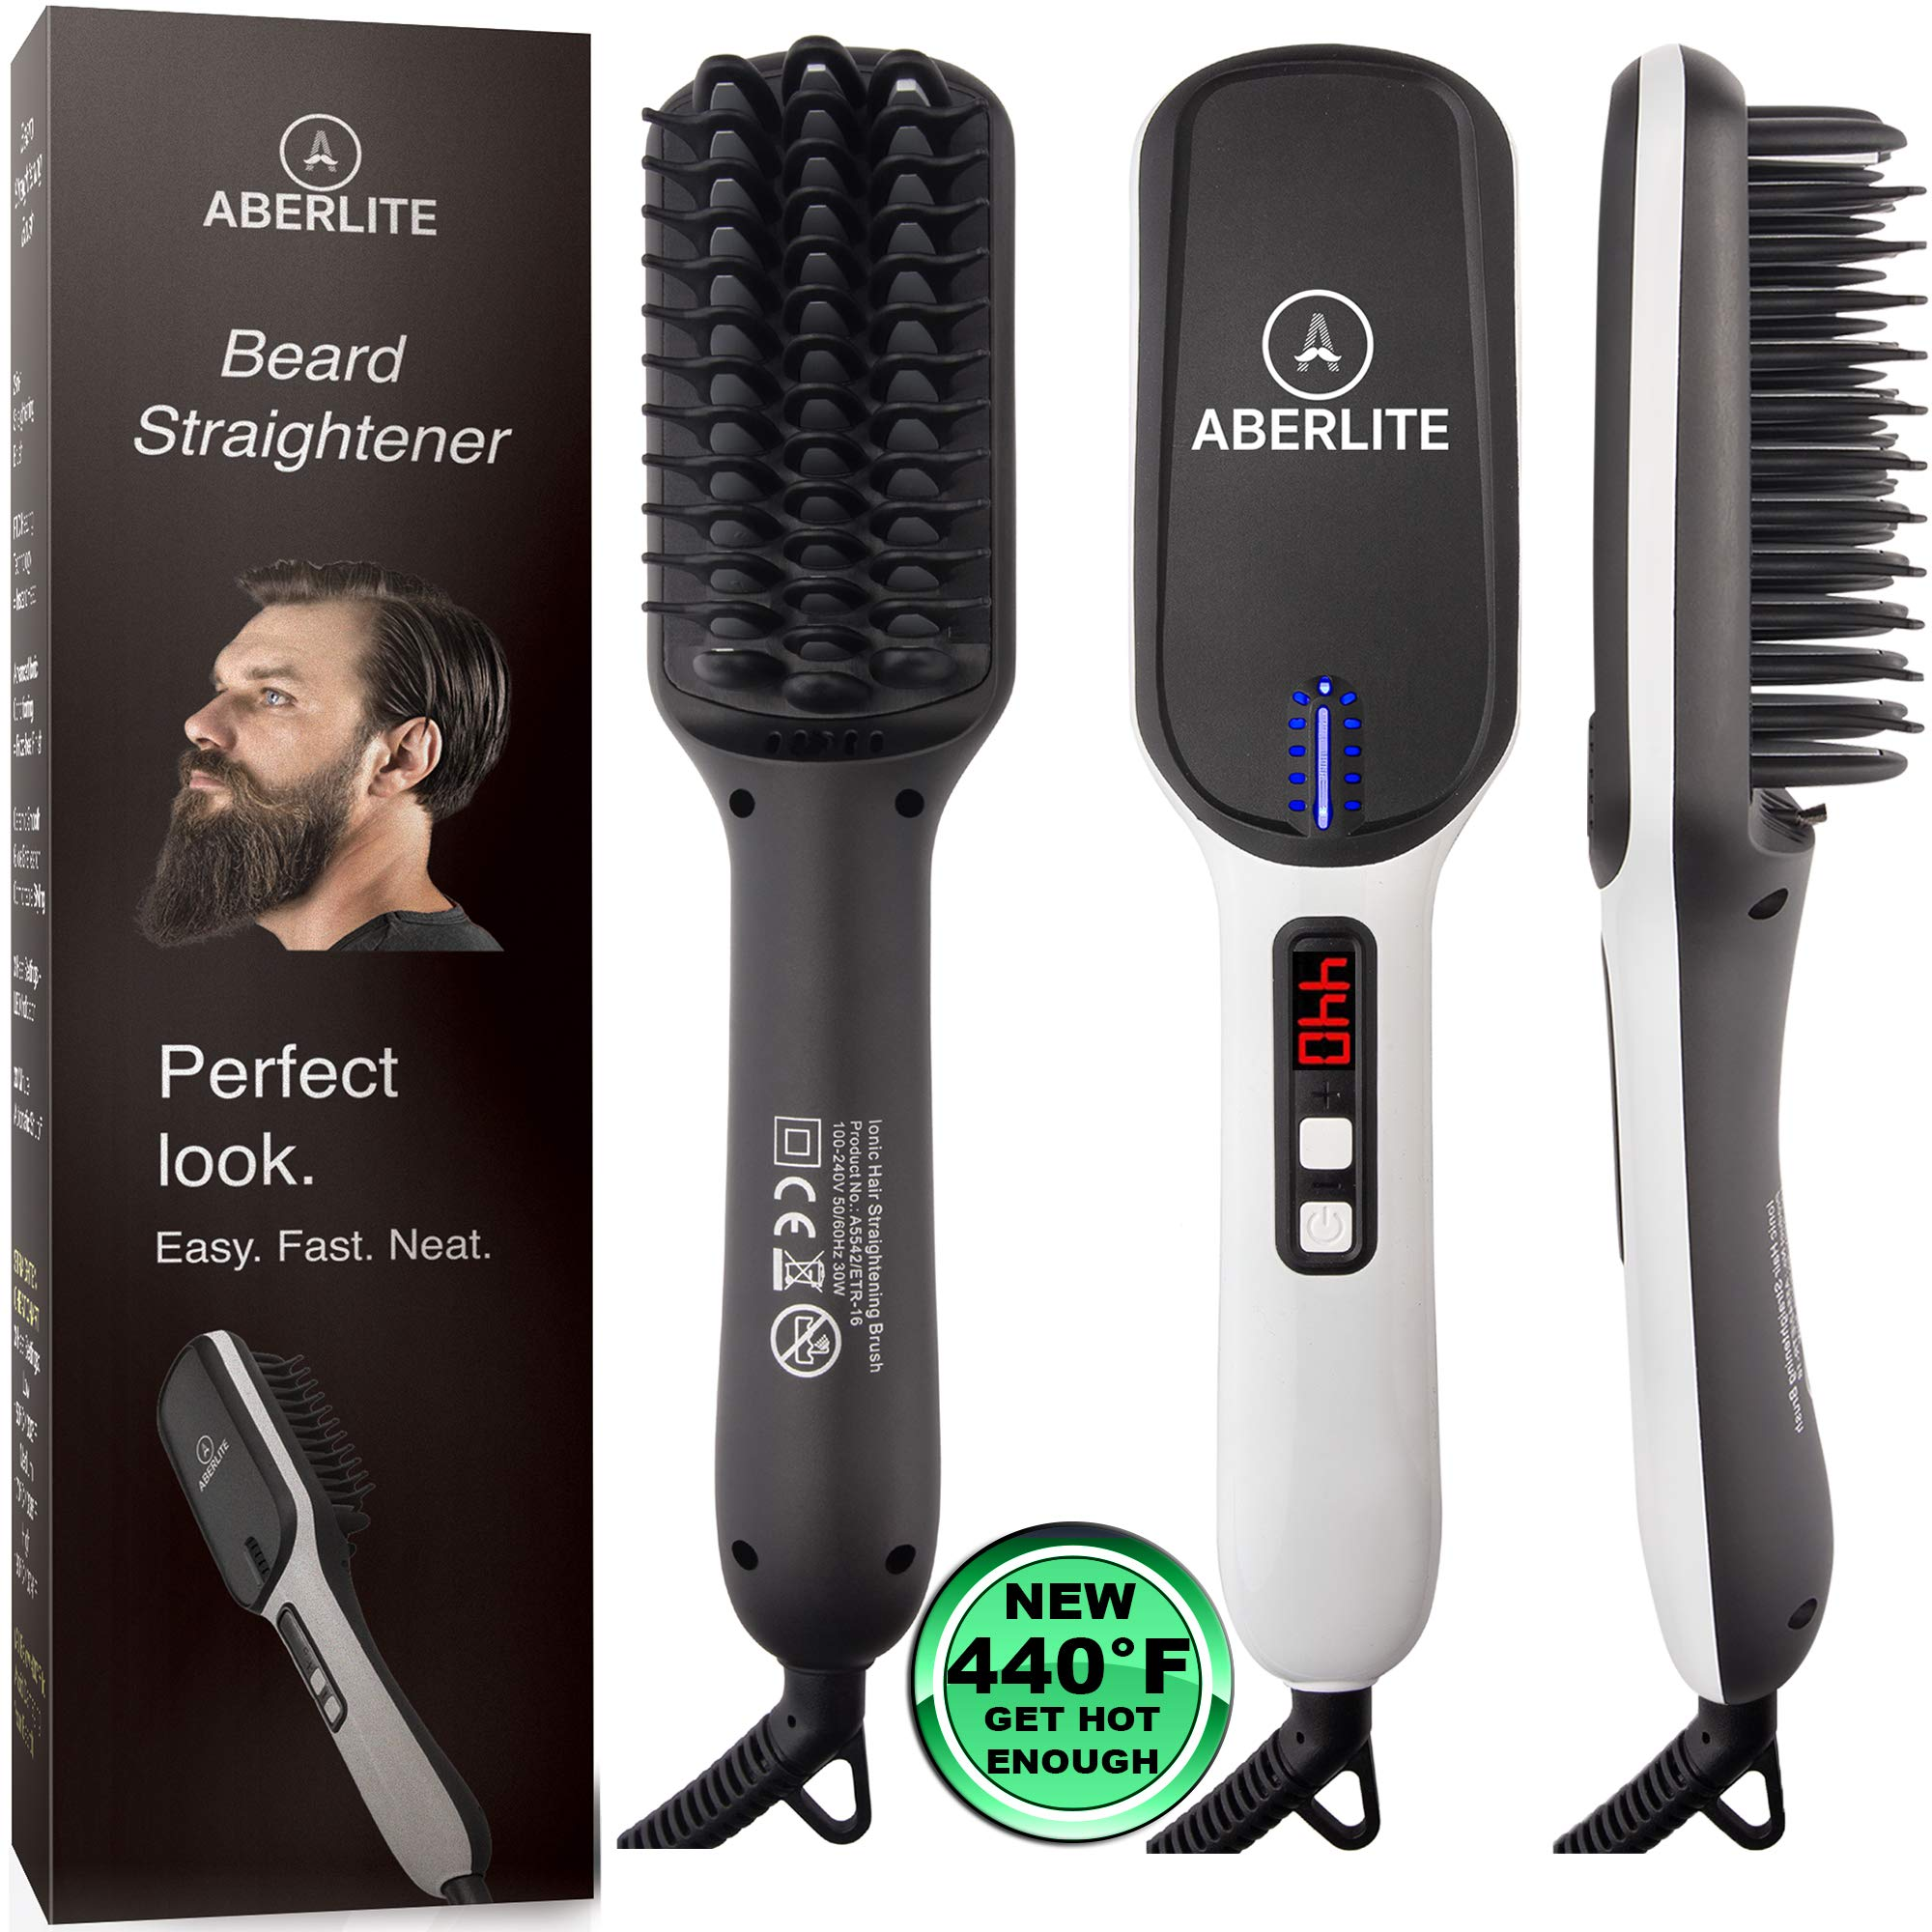 (UPGRADED) Aberlite Beard Straightener for Men - Beard Straightening Heat Brush Comb Ionic - 5 Heat Settings Up to 440F - For Home & Travel by Aberlite